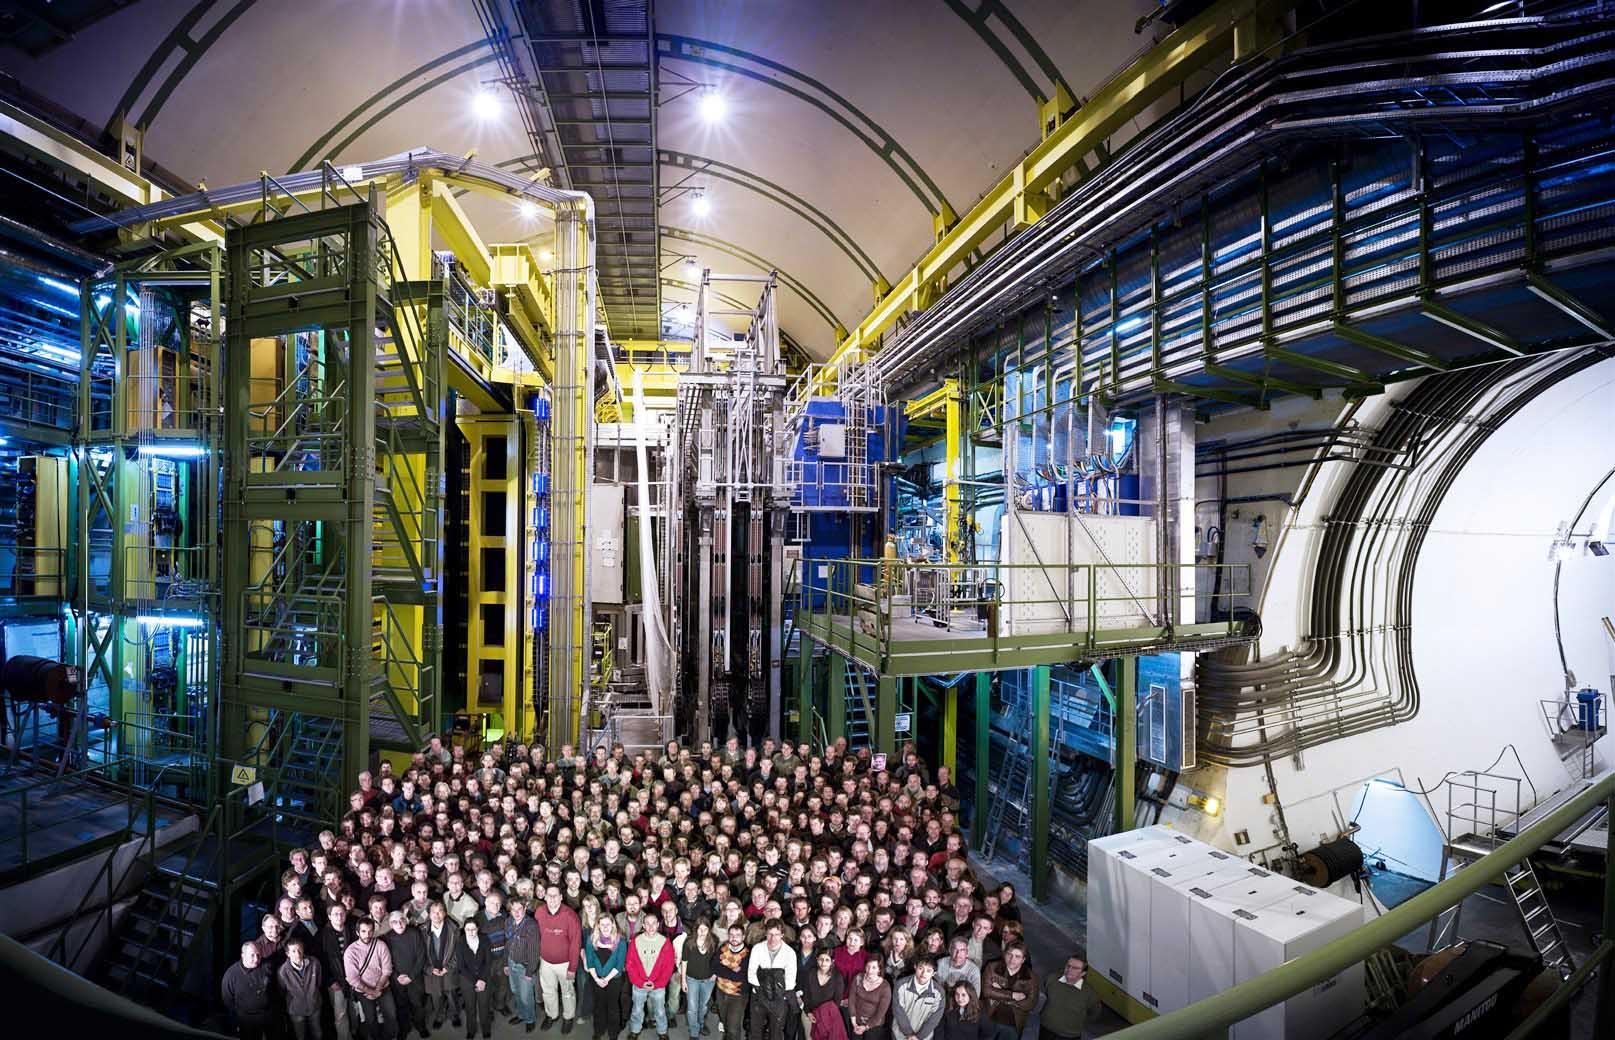 apparato LHCb Cern Ginevra